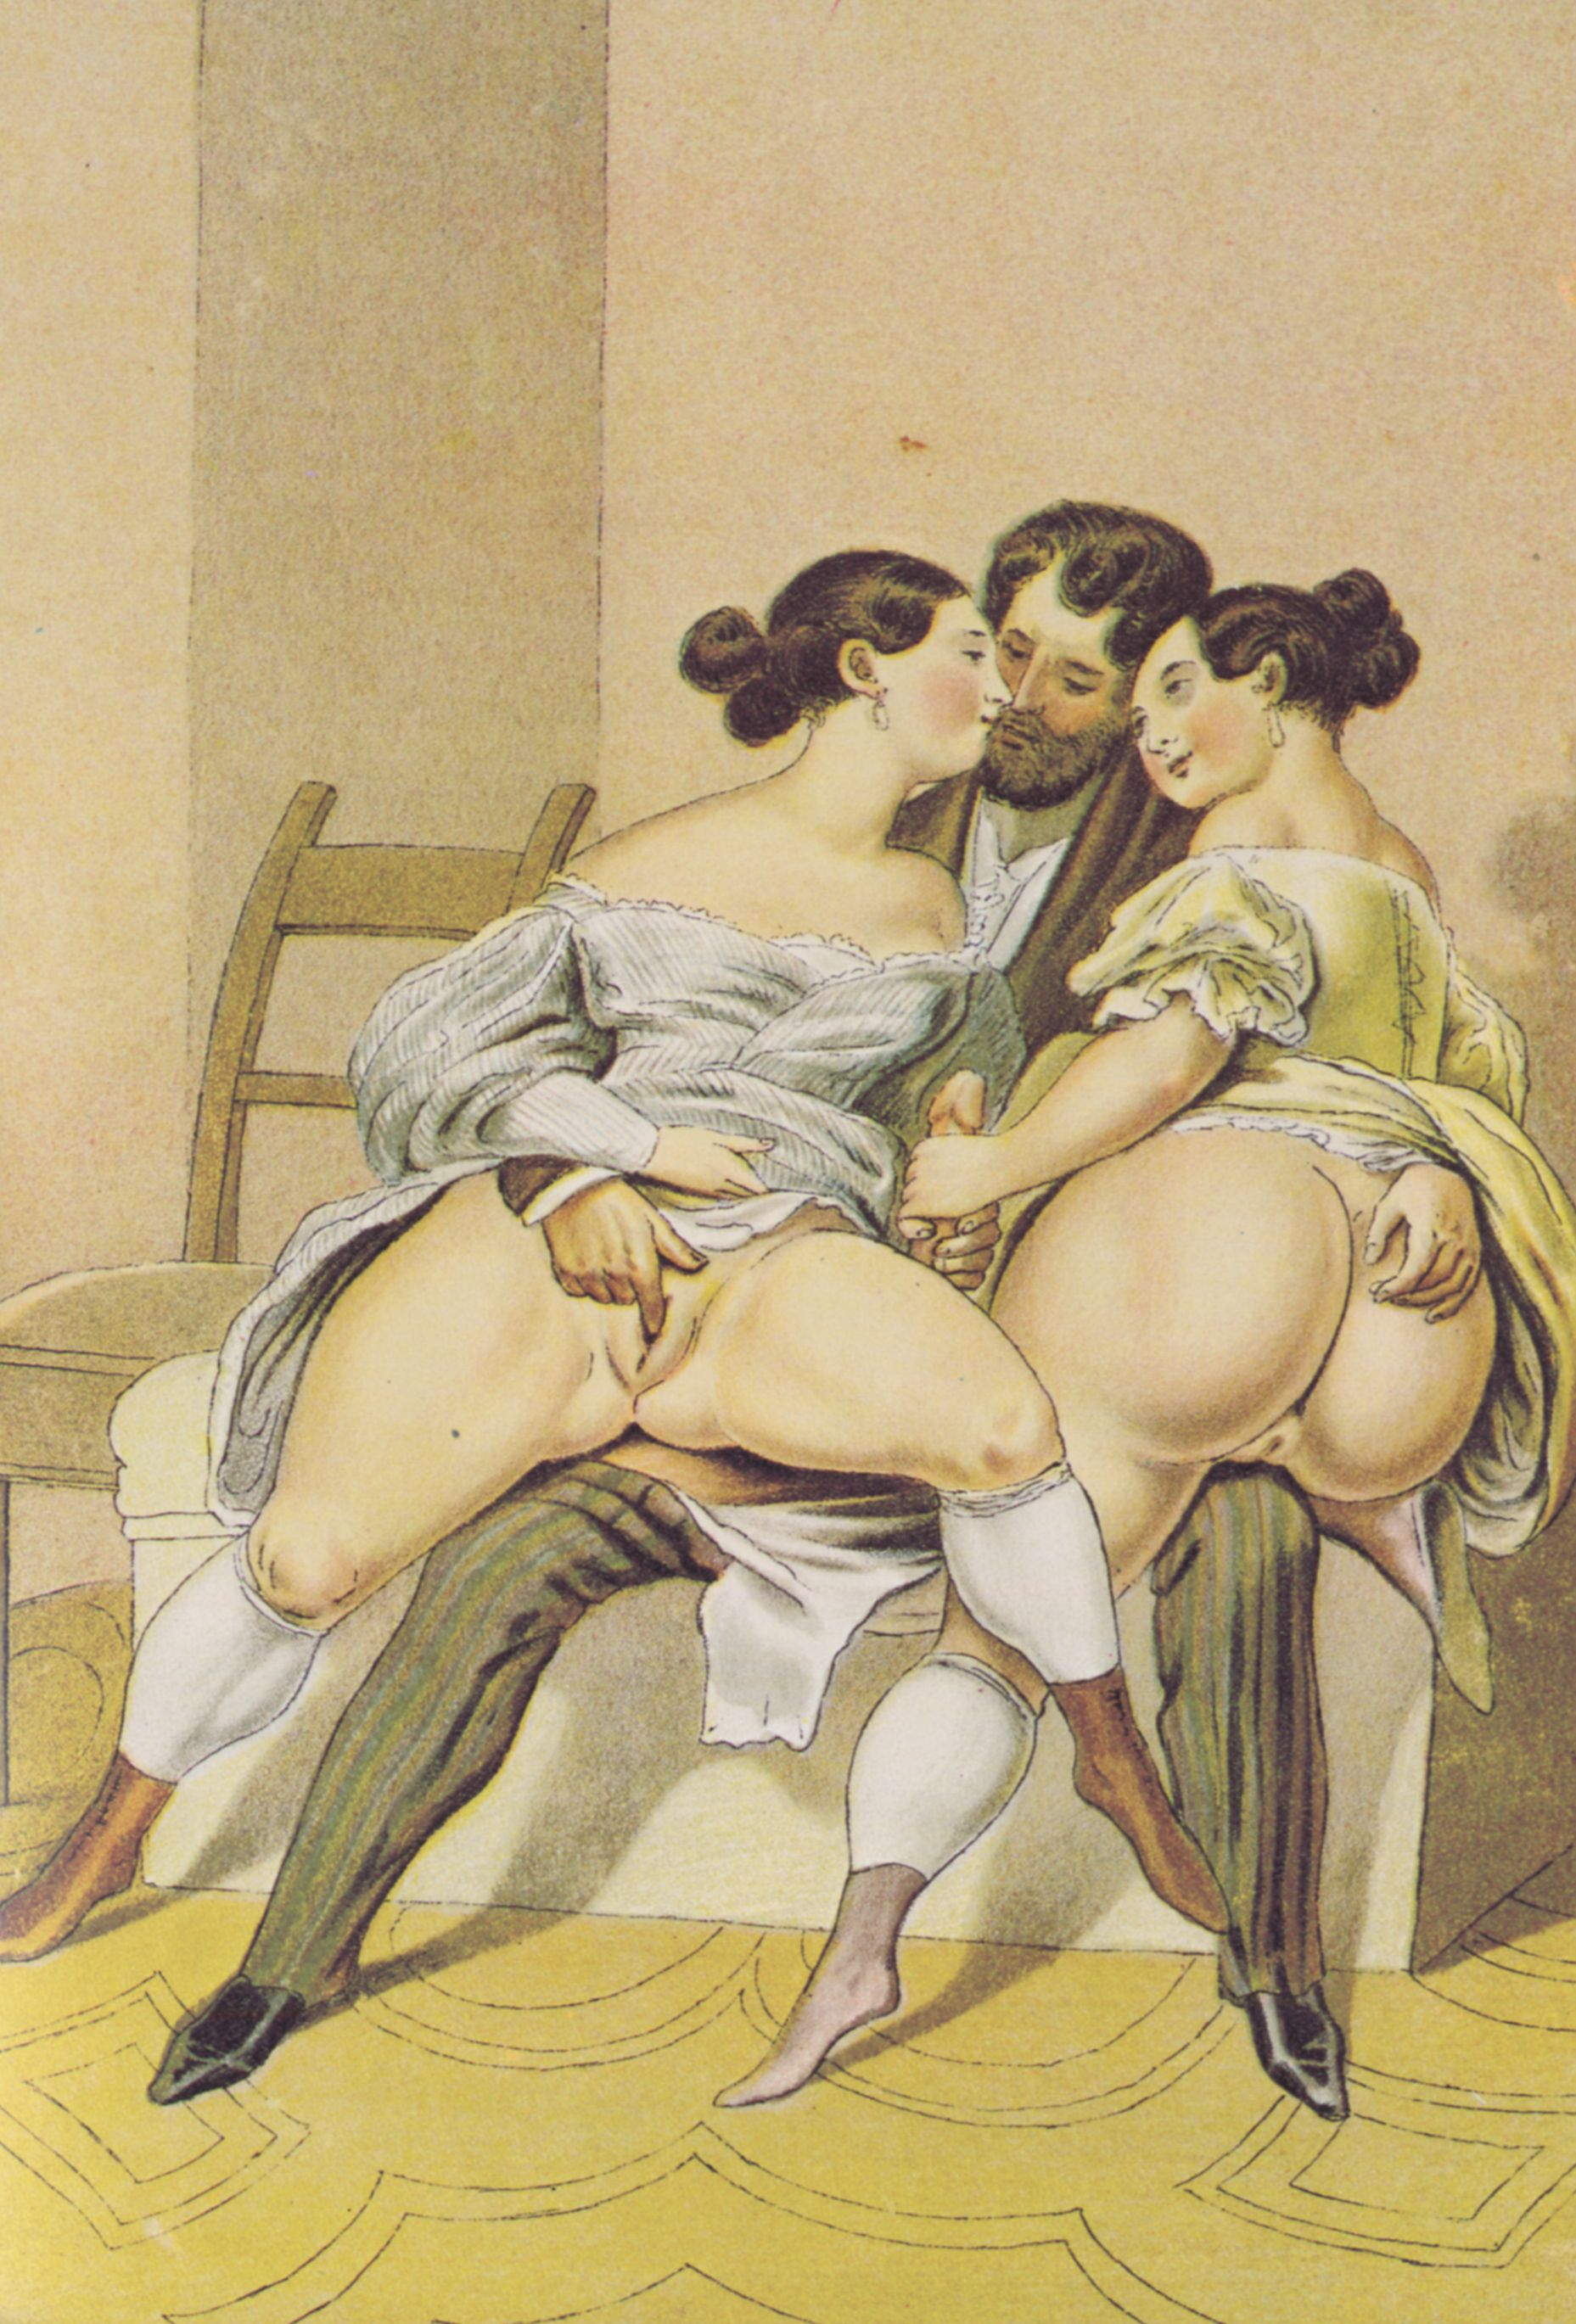 1910s Porn Anal - Threesome - Wikipedia